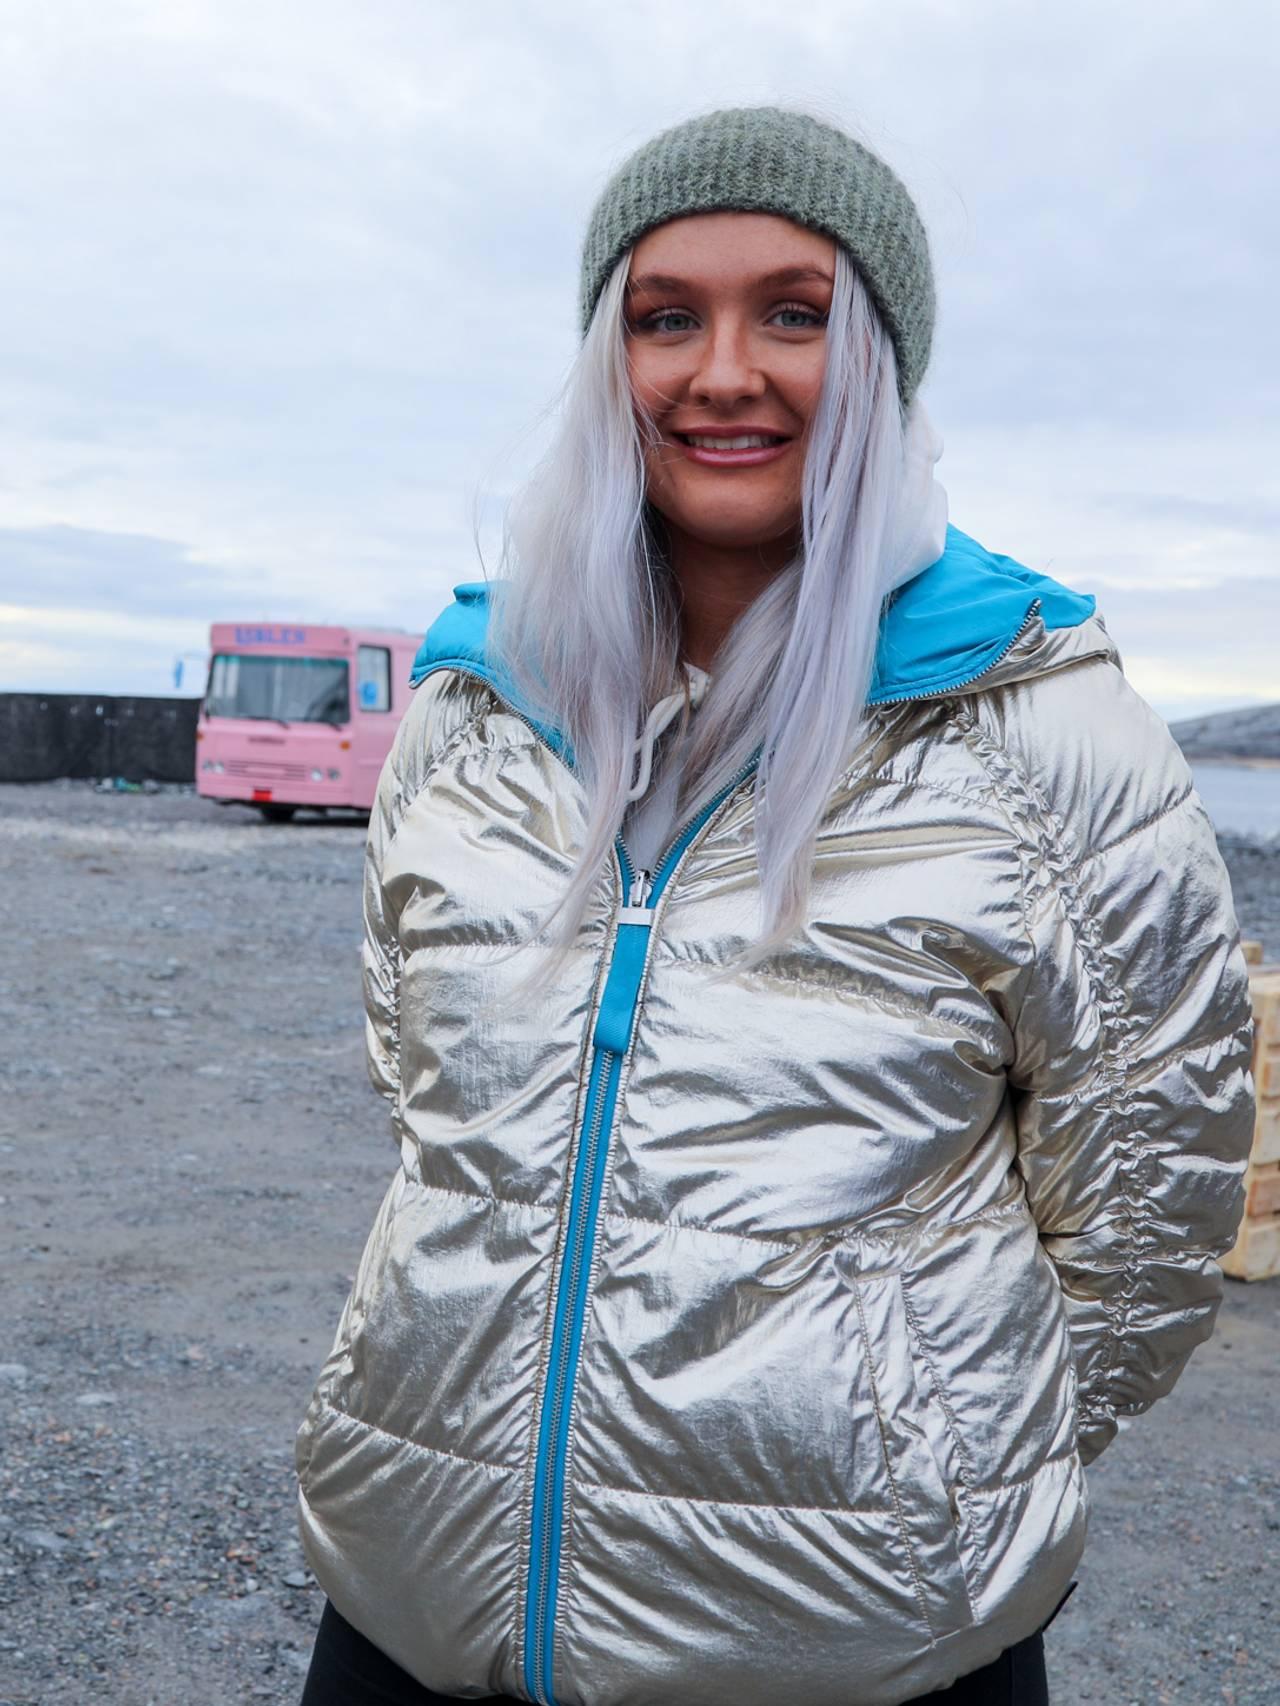 Sara Landaas er russepresident for Bodin vidaregåande skule og har vore med å arrangere årets russecamp på Langstranda i Bodø.